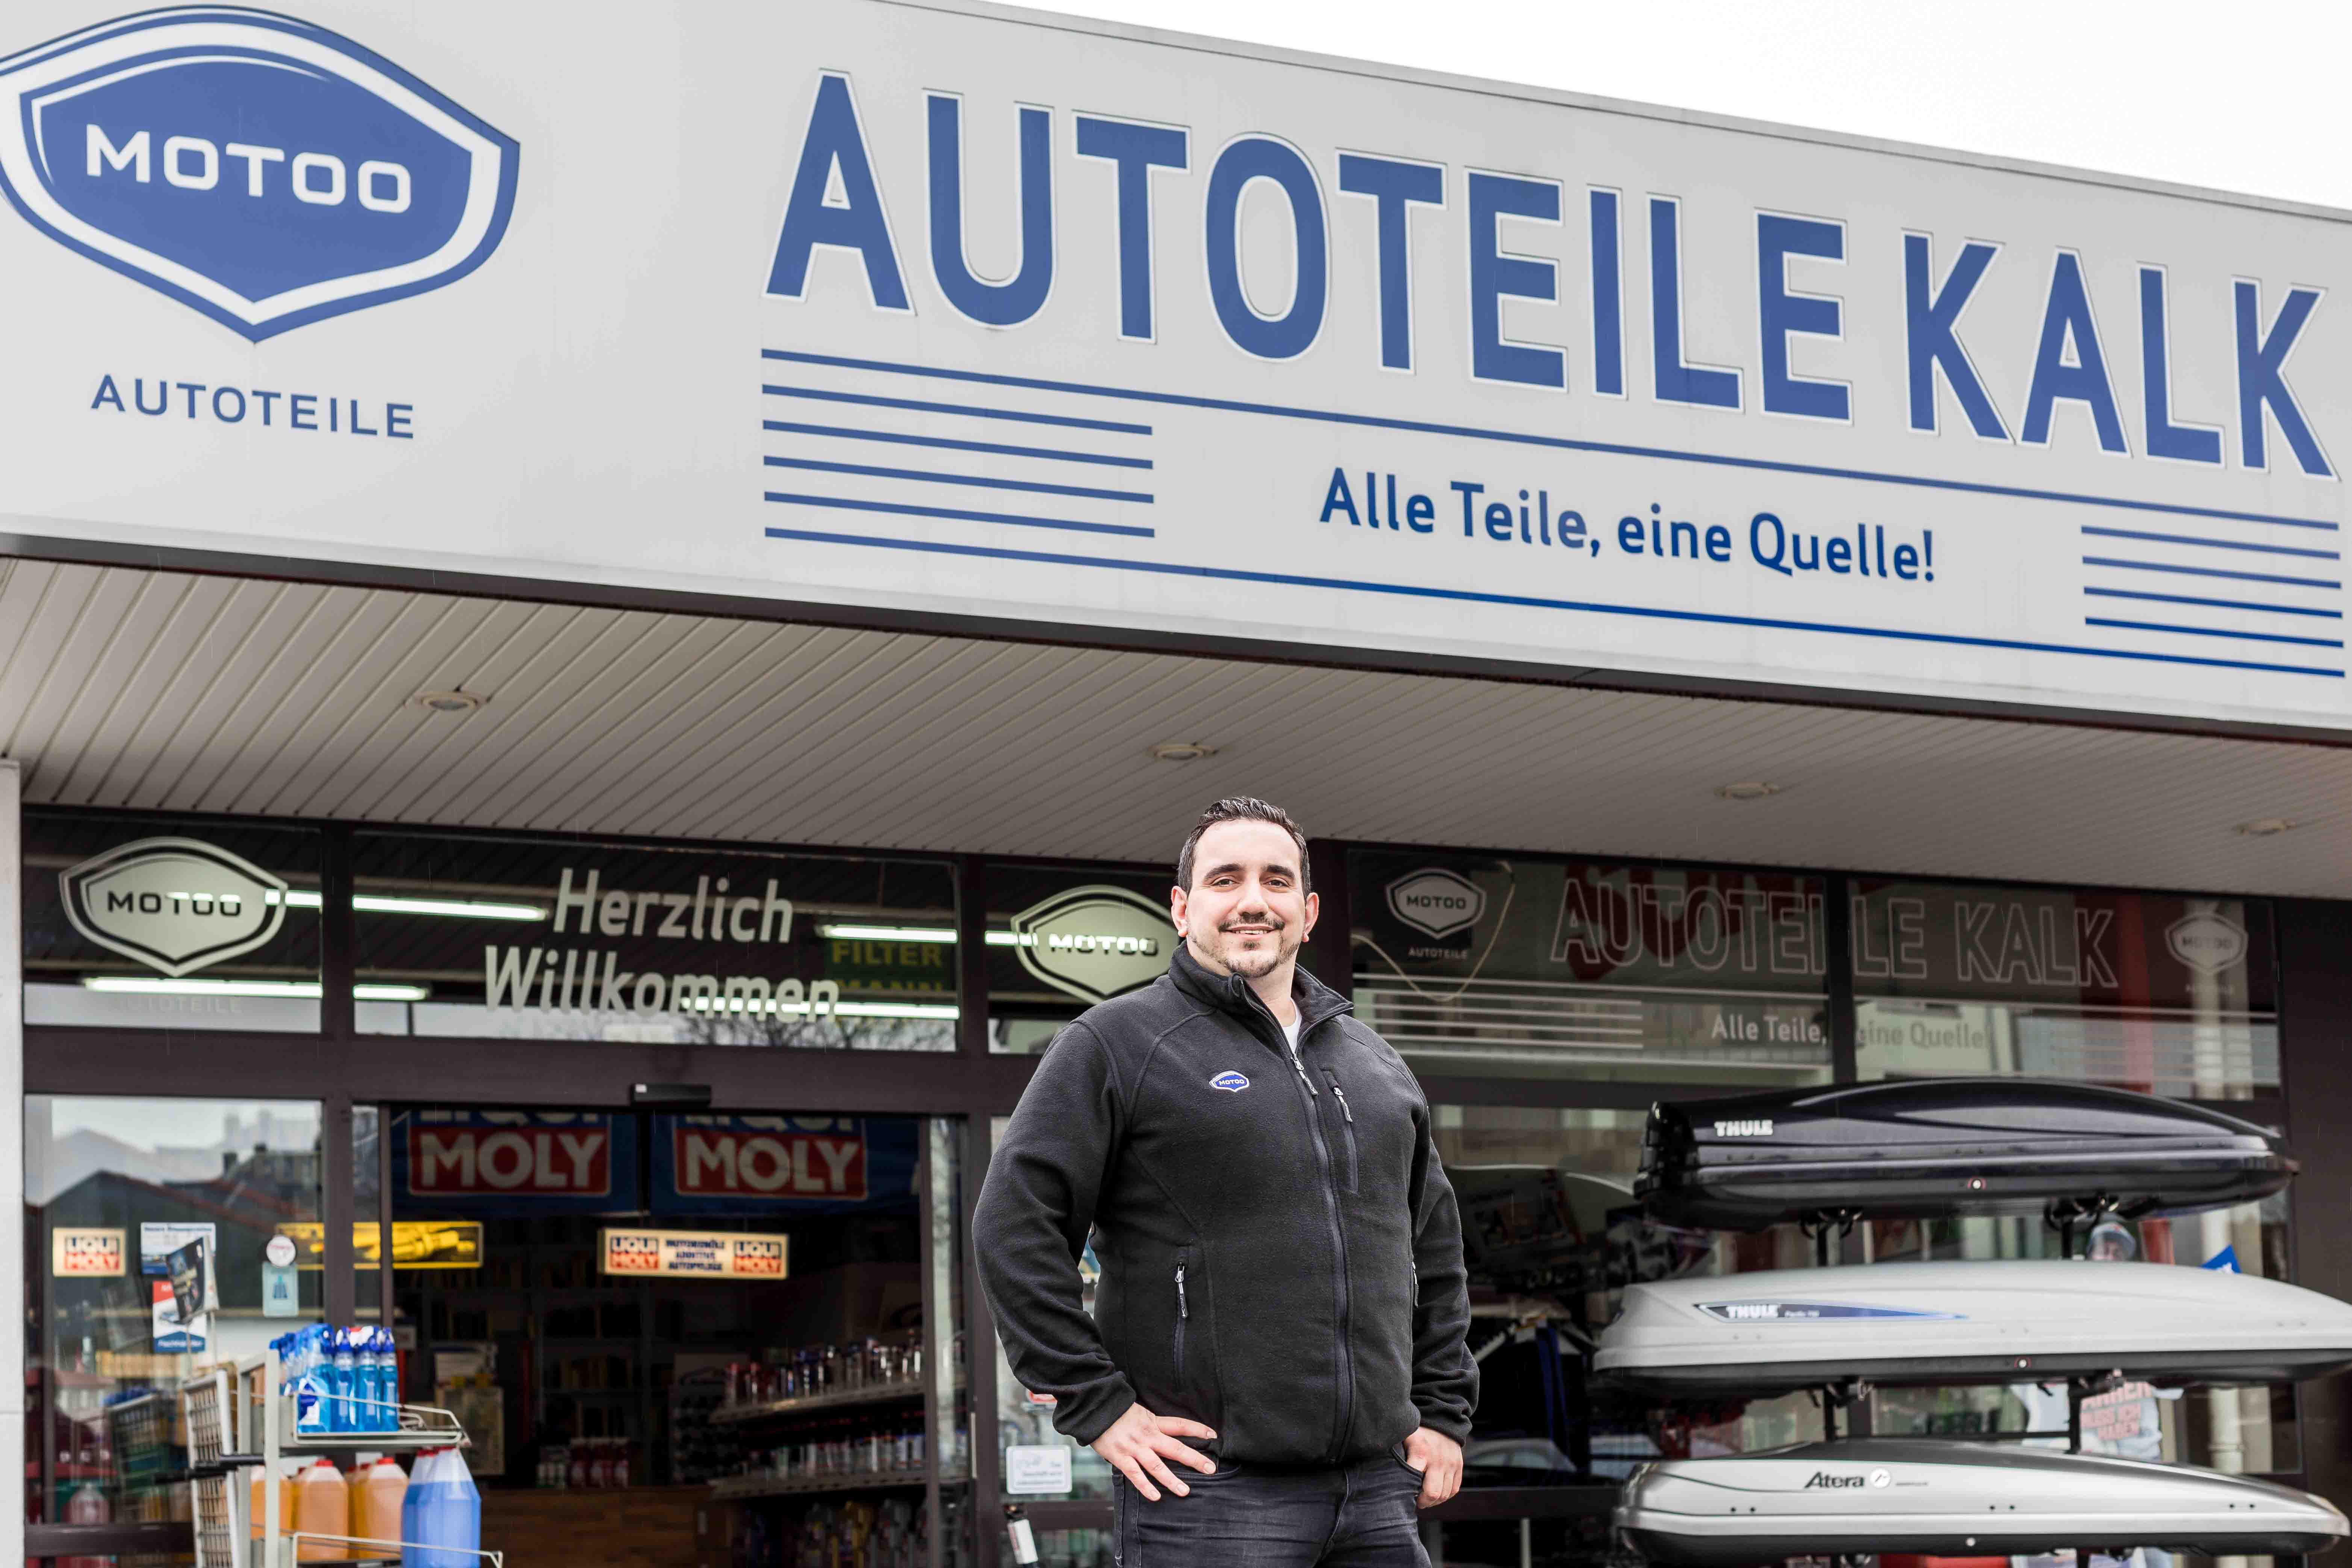 Autoteile Köln-Kalk